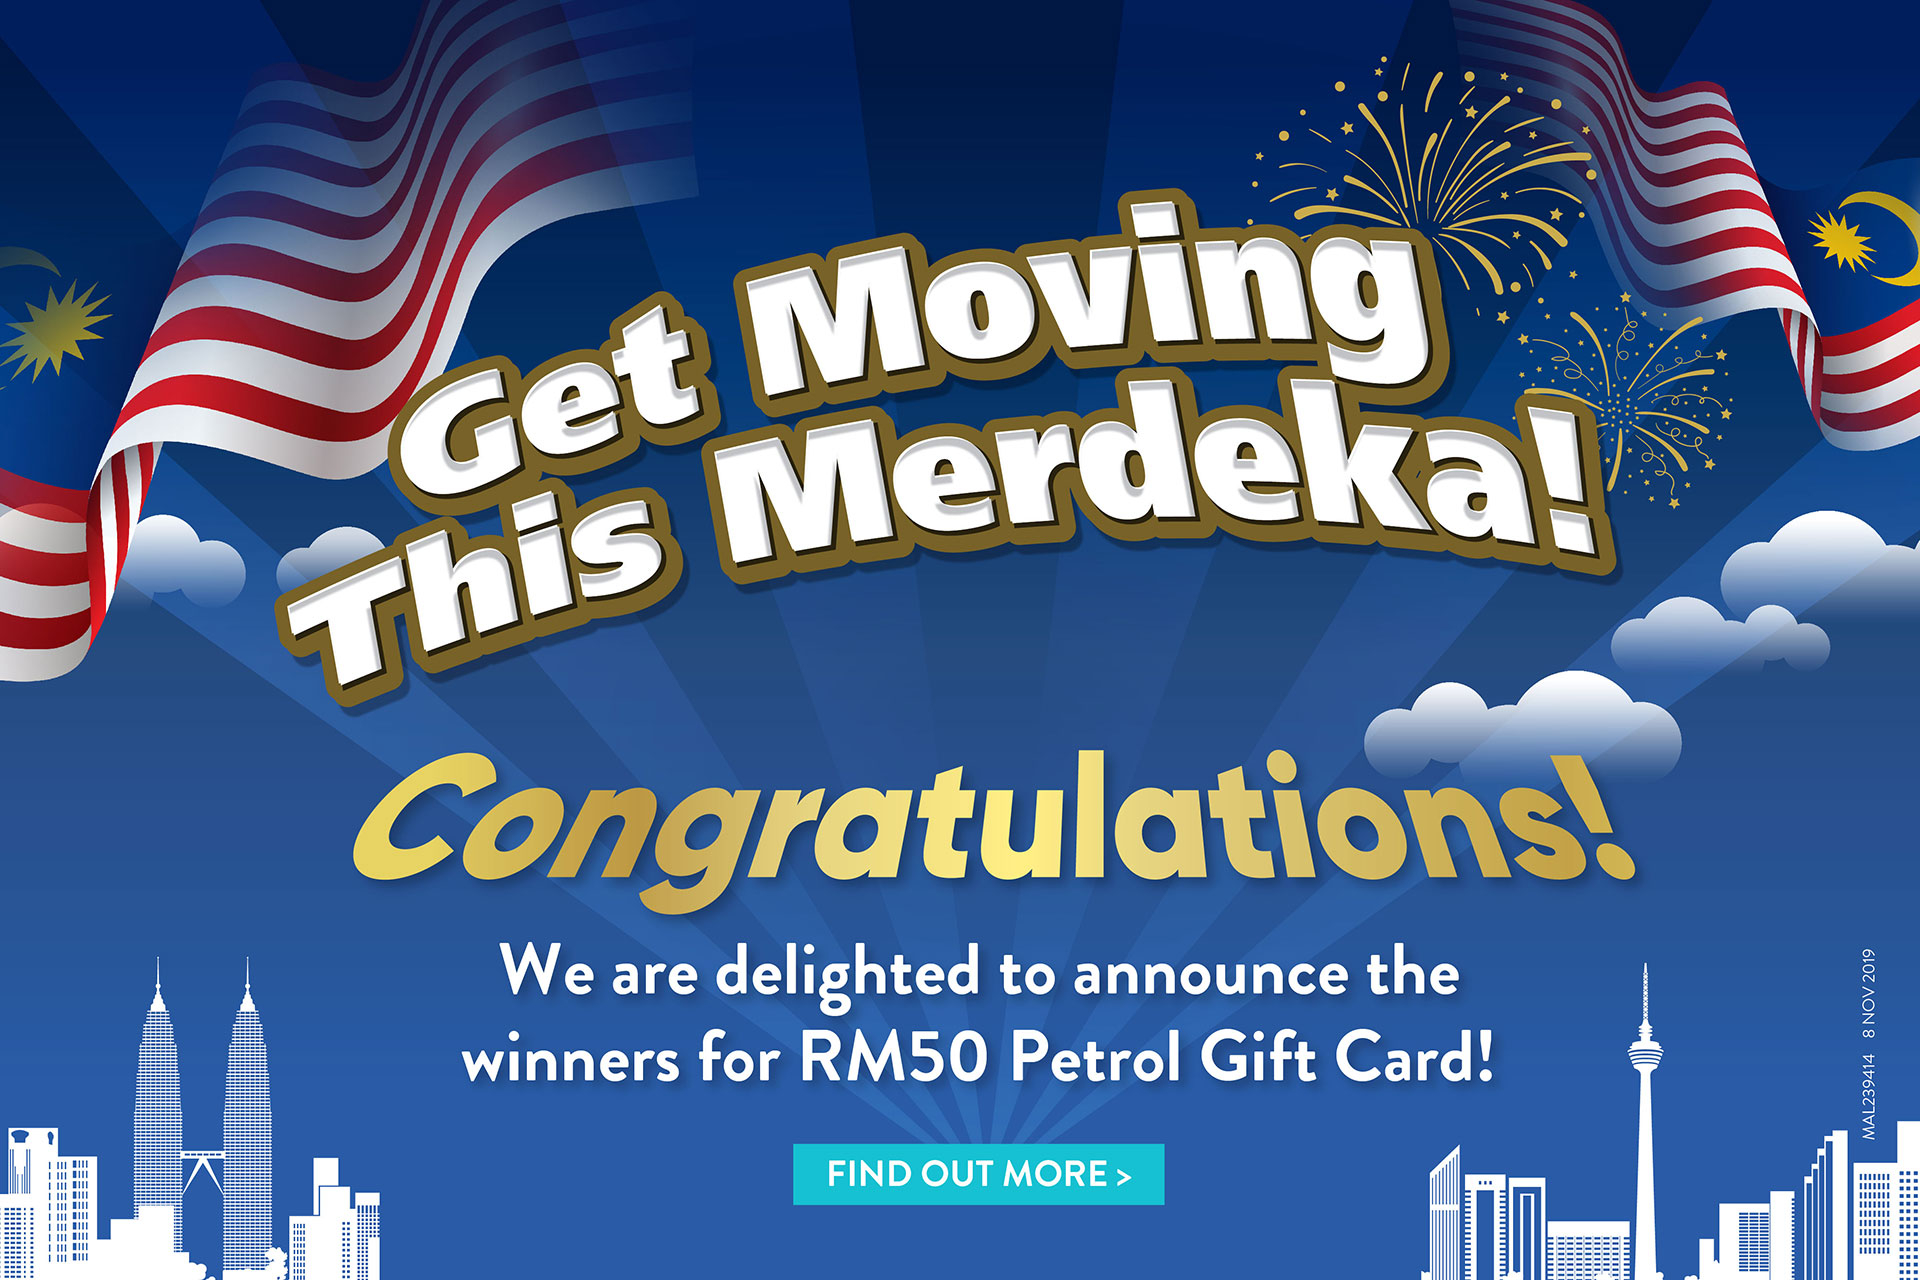 Get Moving This Merdeka - Result